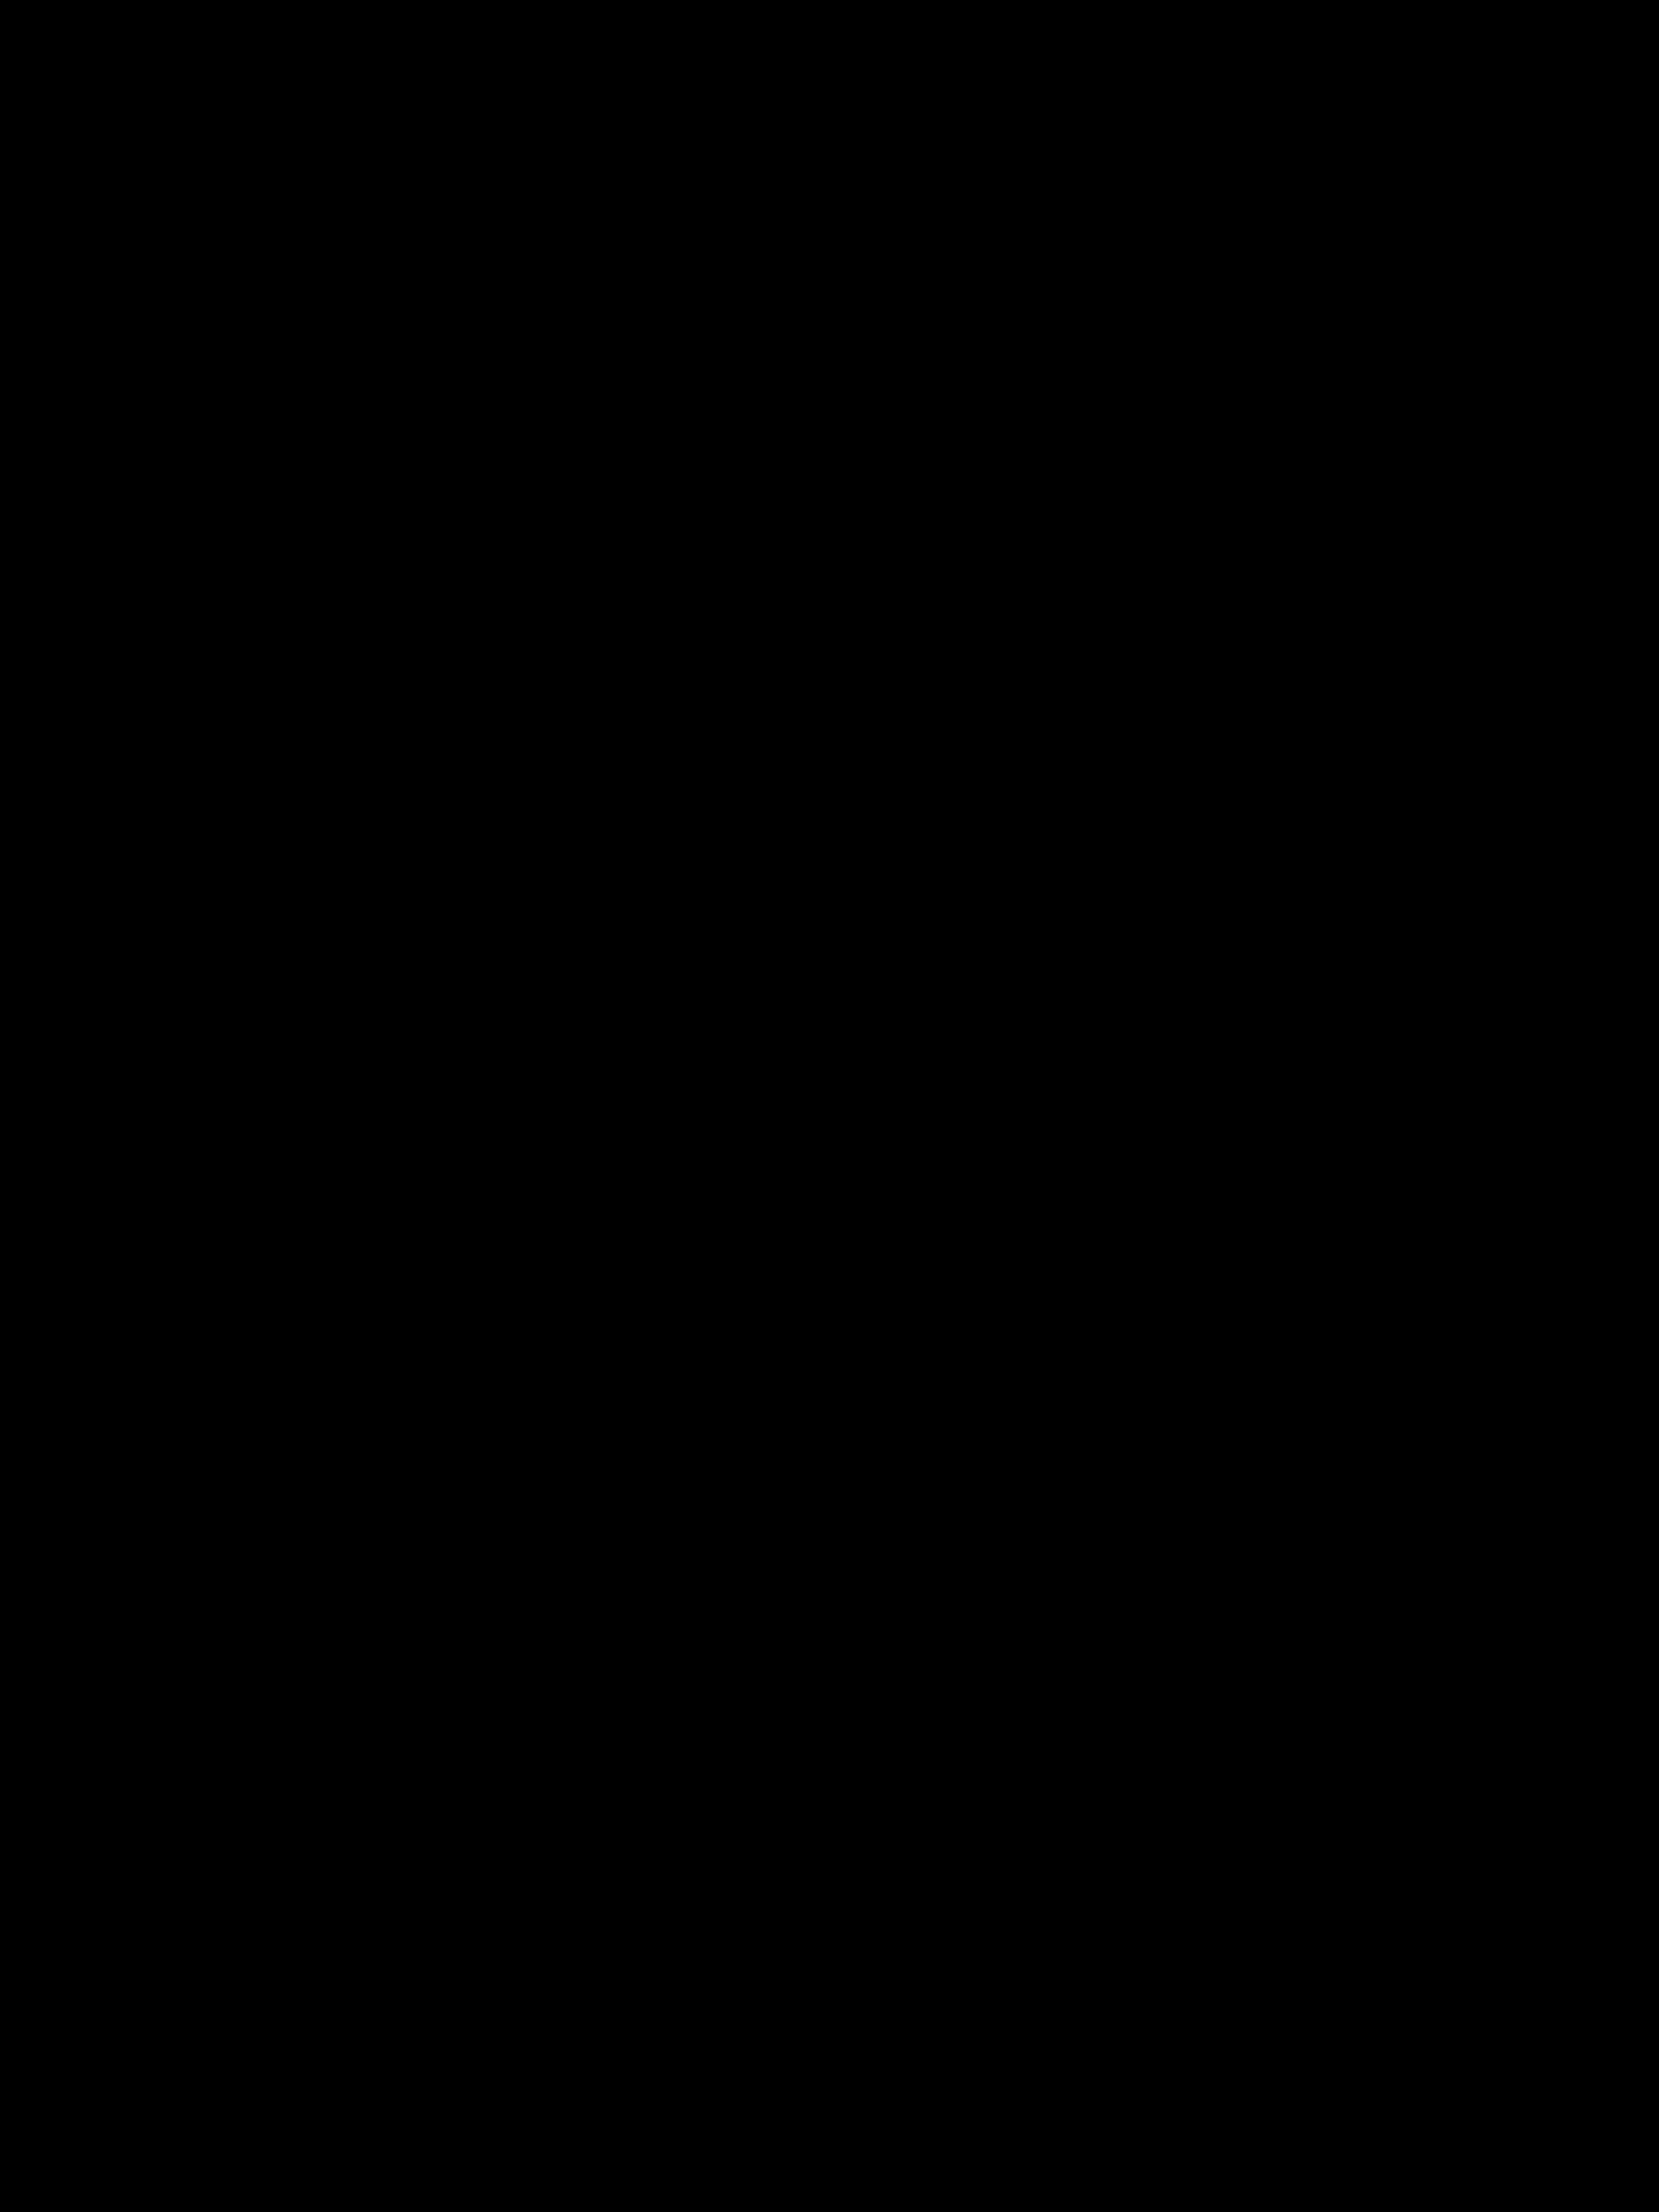 Statistics clipart statistics symbol. File mu lc svg